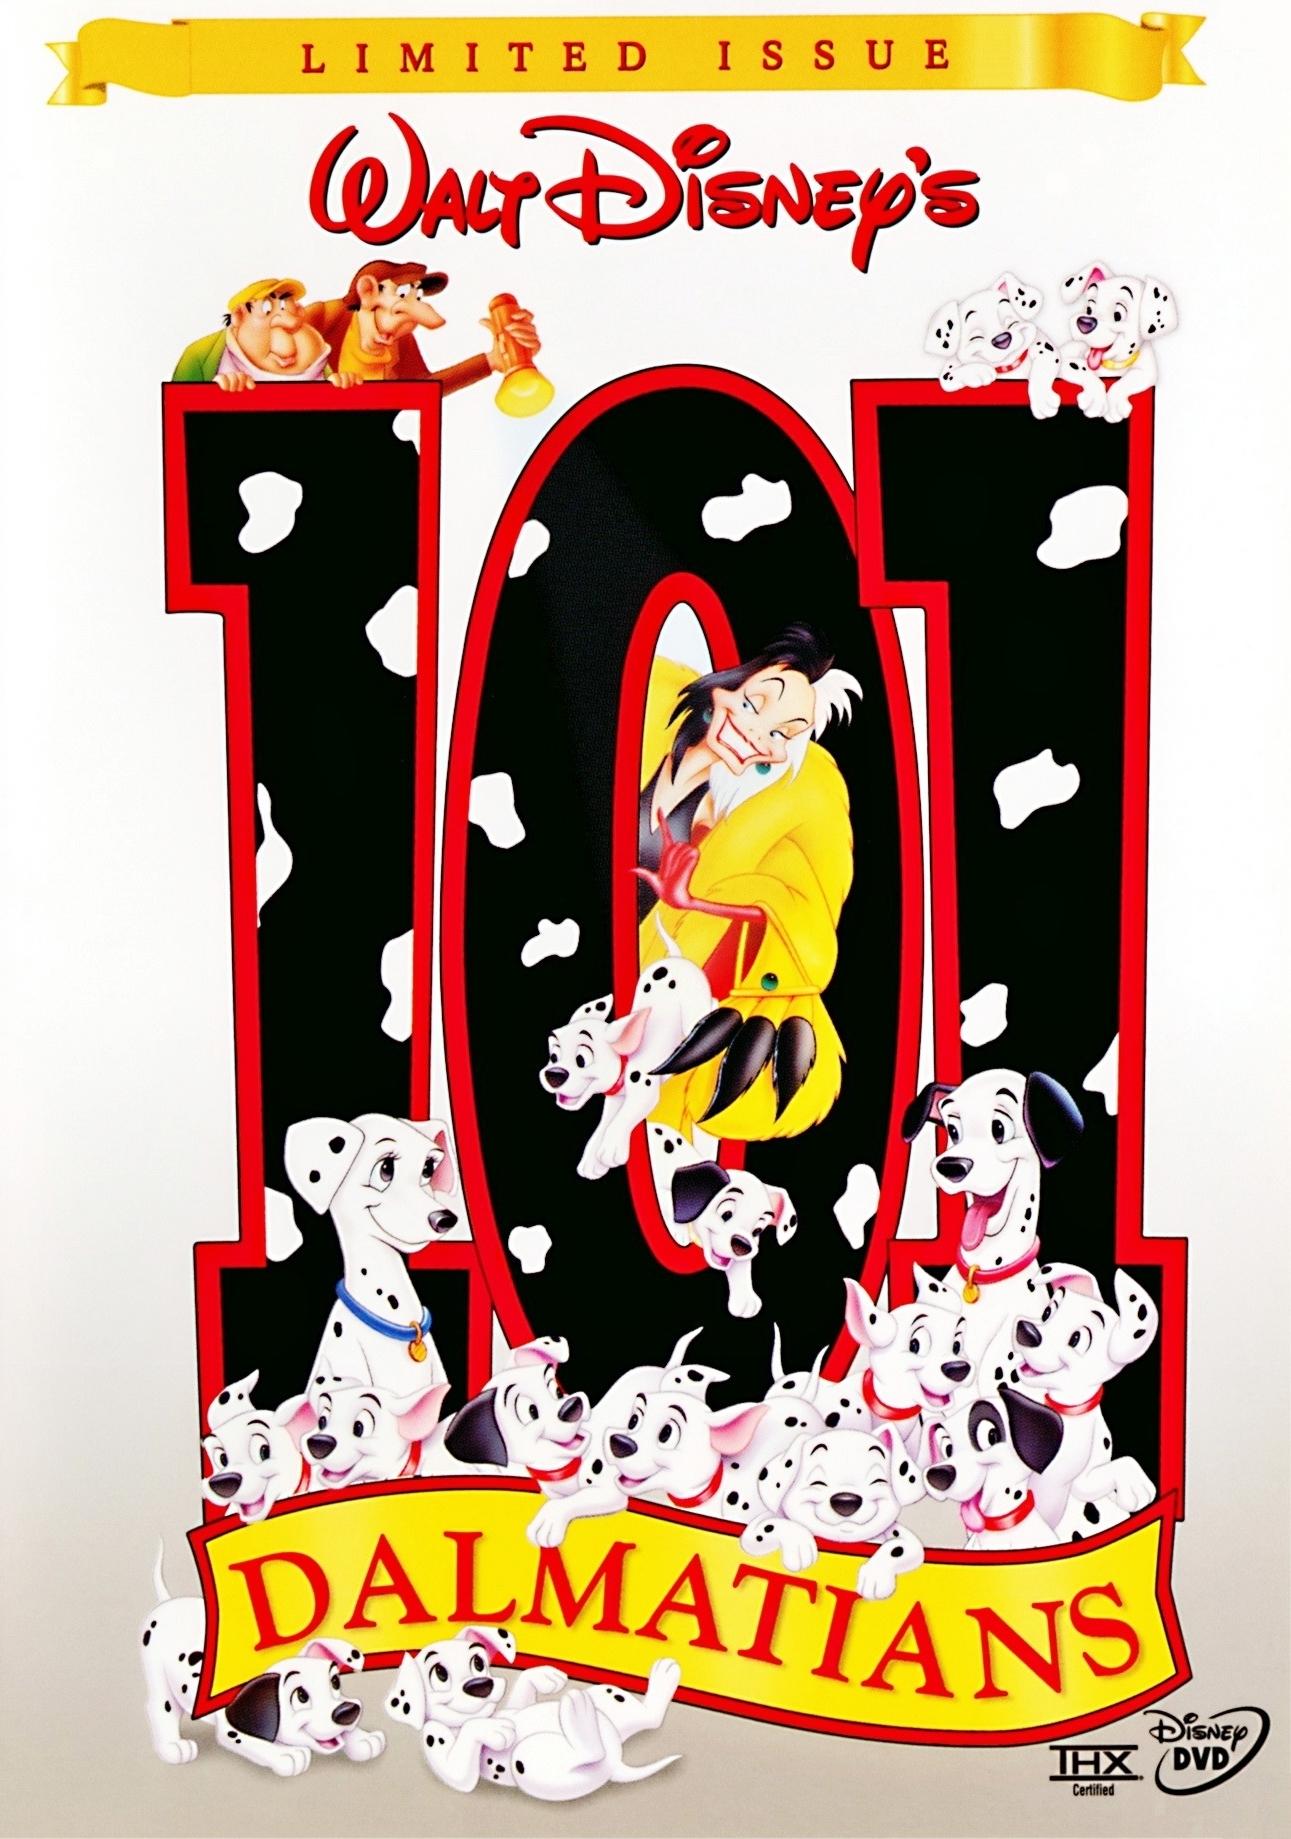 101 Dalmatians Walt Disney Limited Issue Fullscreen Dvd